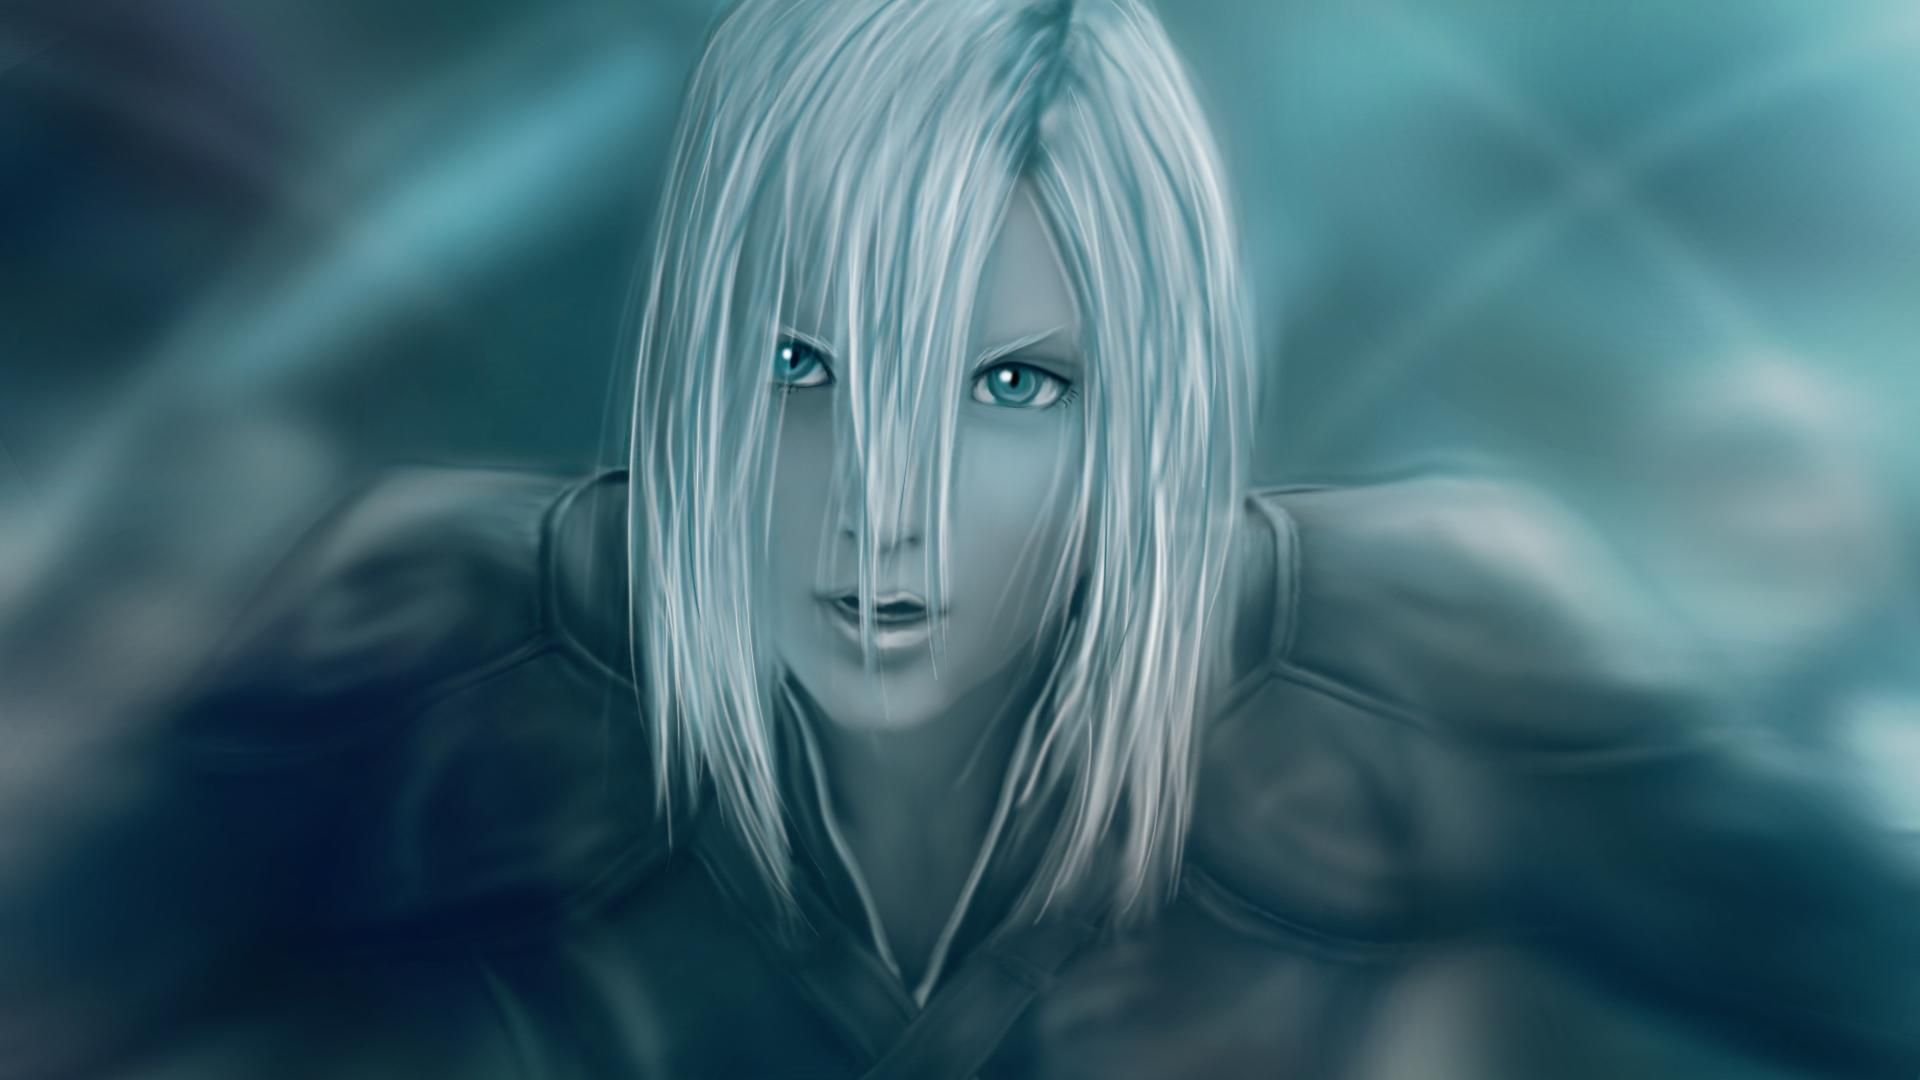 Final Fantasy Kadaj Wallpaper